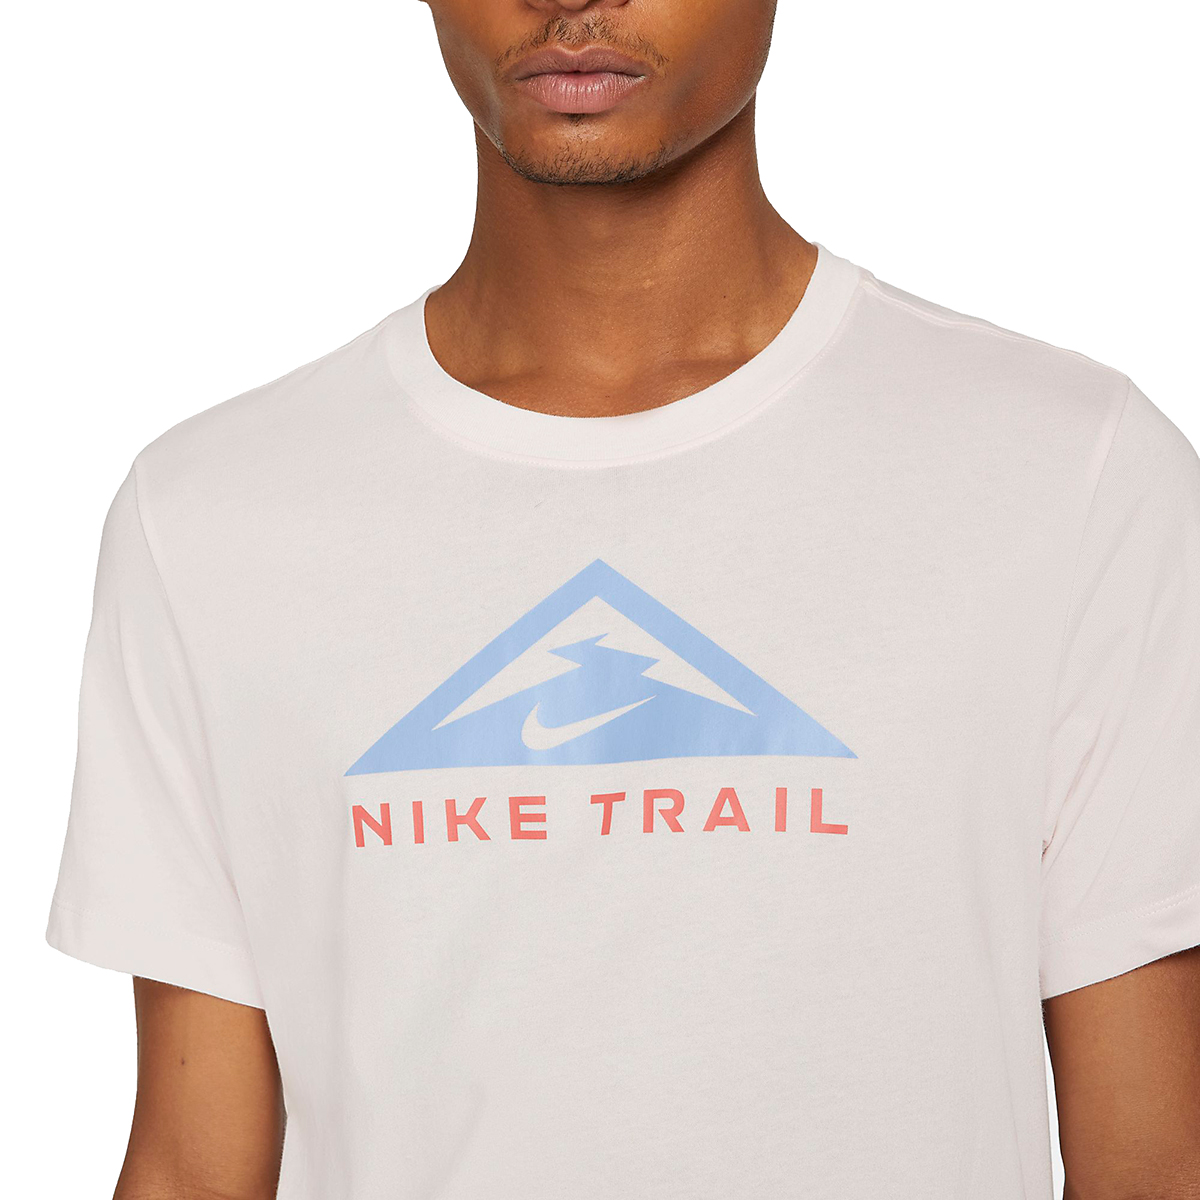 Men's Nike Dri-FIT Short Sleeve Trail Running T-Shirt - Color: Light Soft Pink - Size: XS, Light Soft Pink, large, image 3